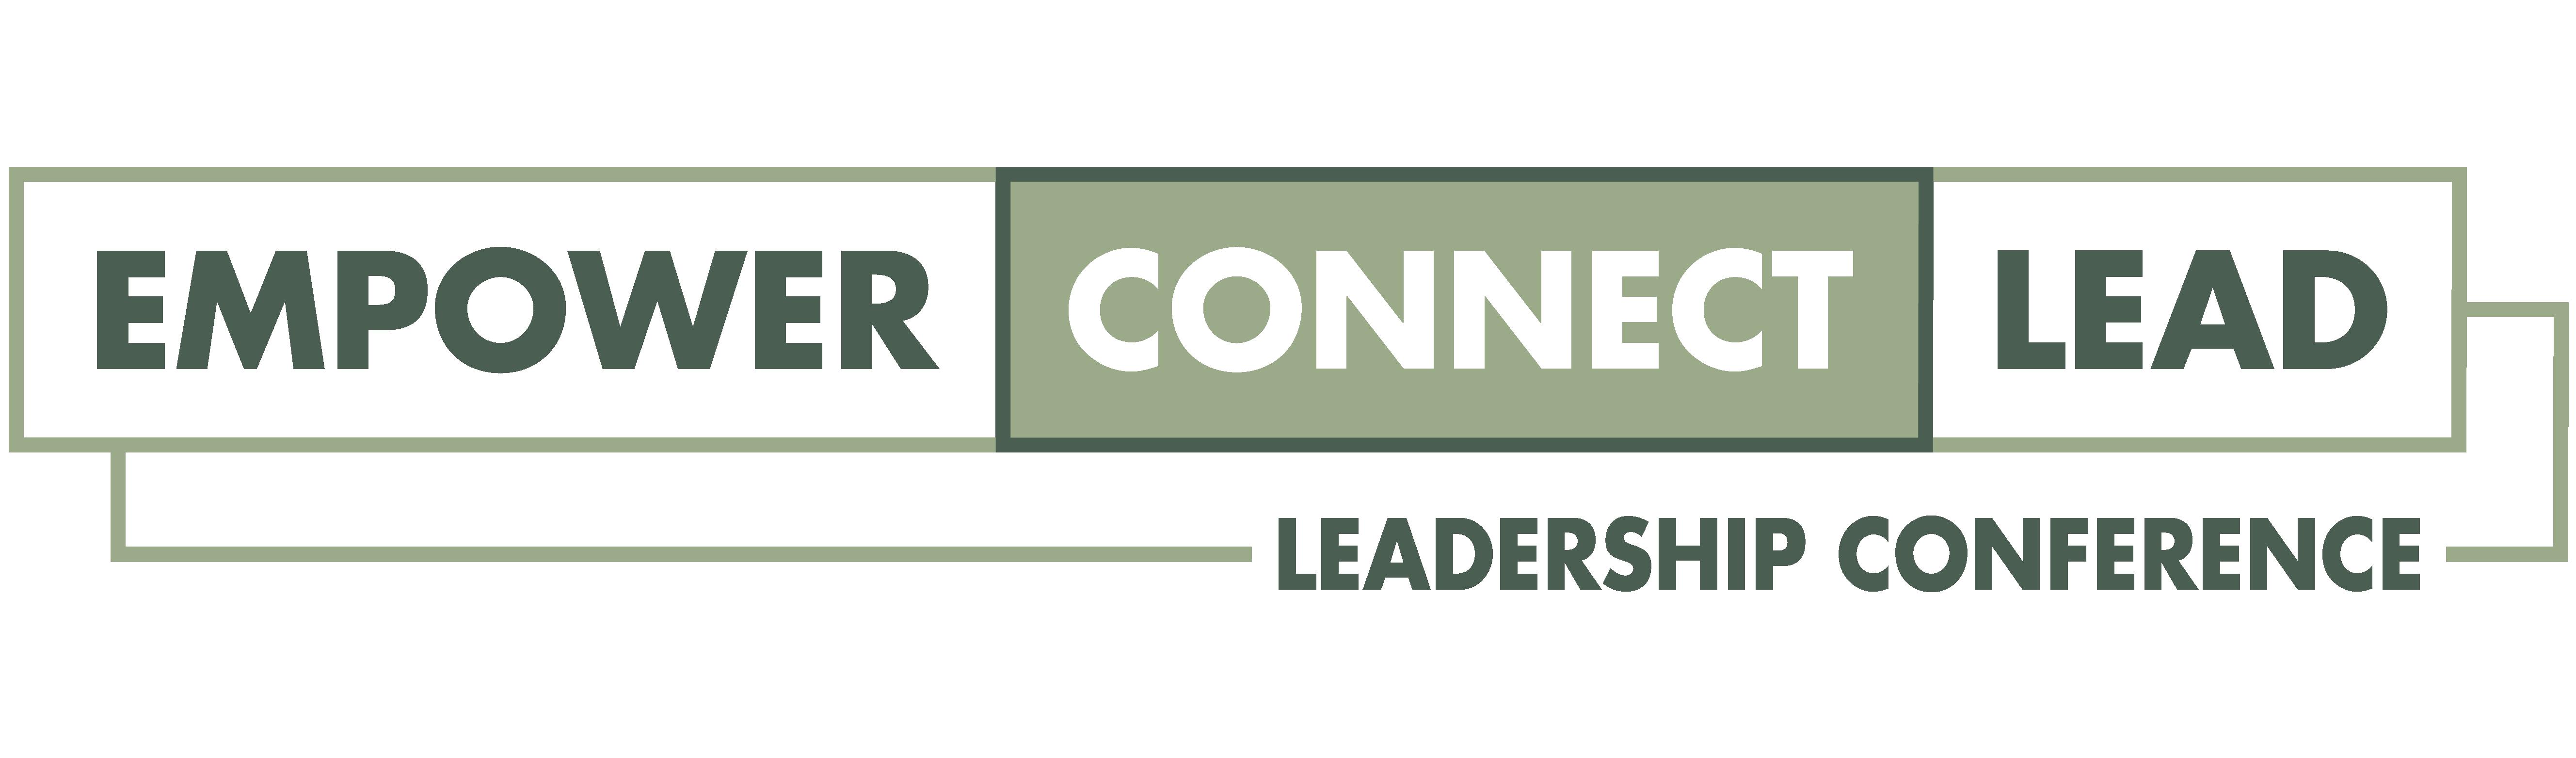 Leadership Conference – October 15-17, 2018 | Arizona